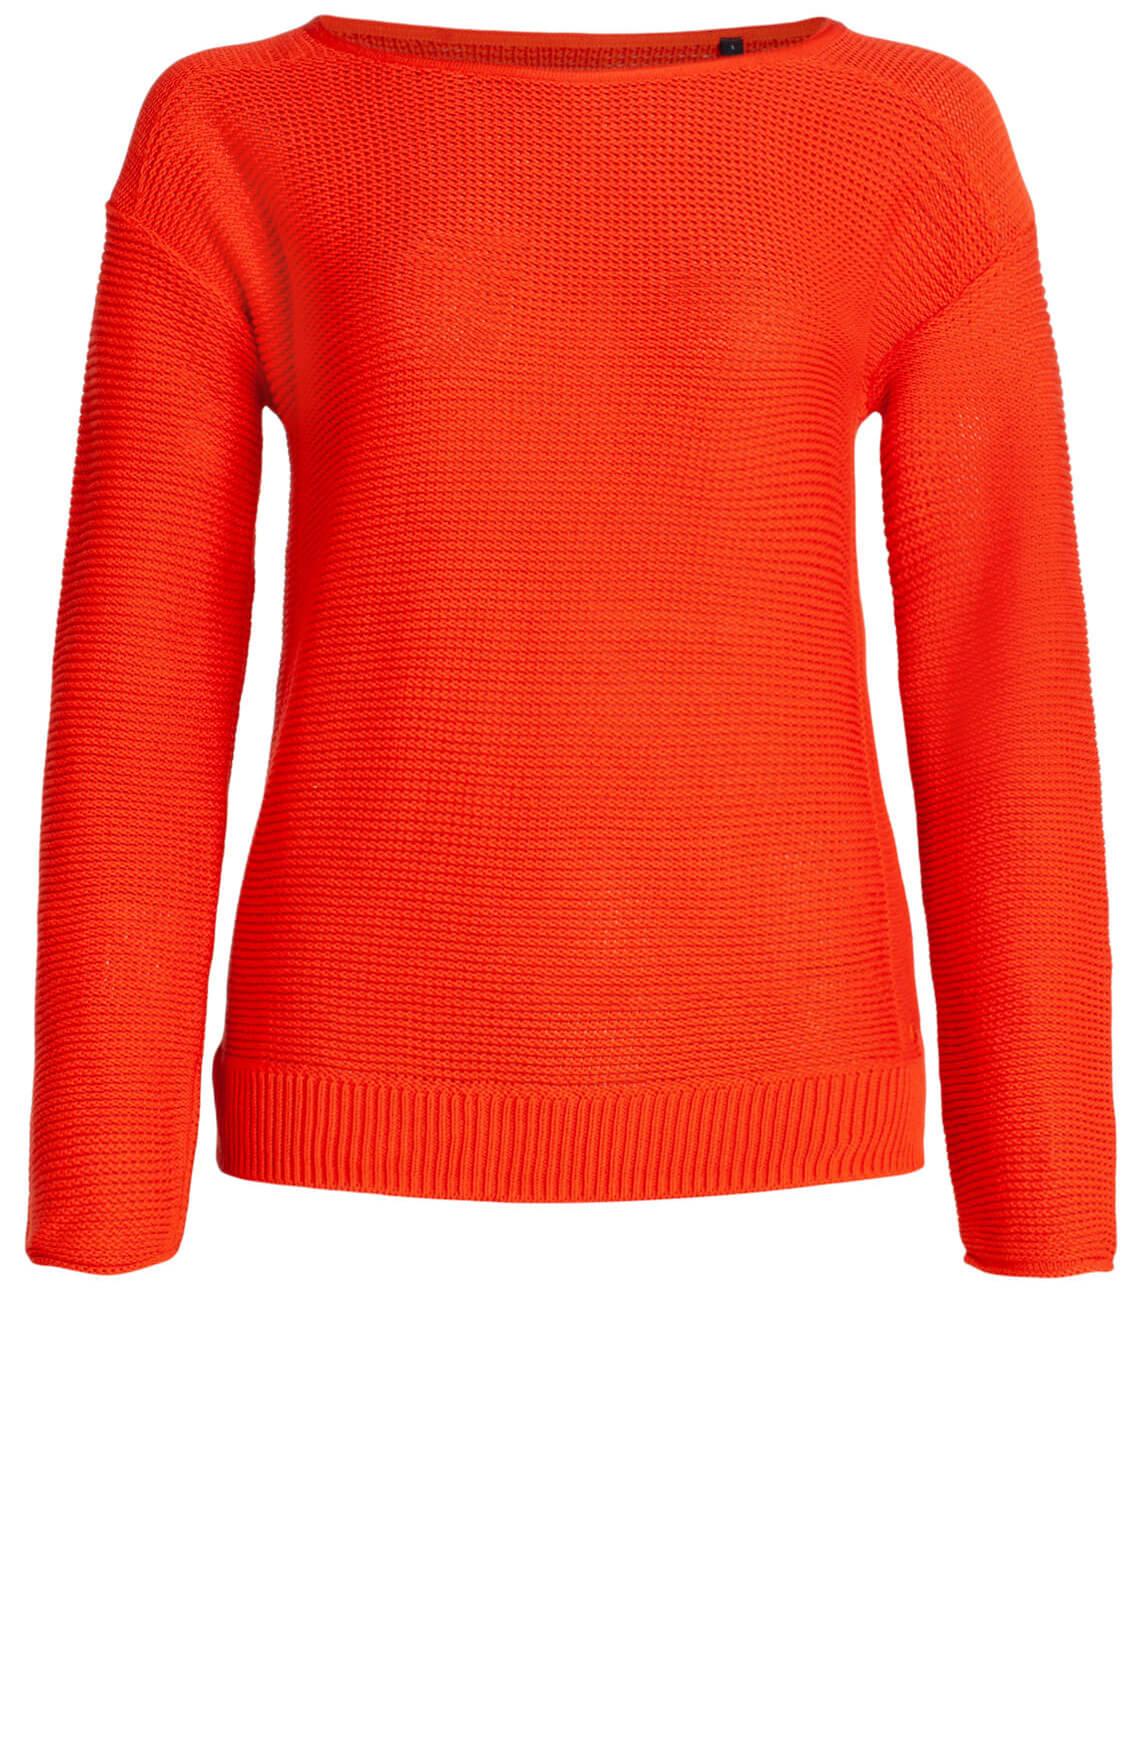 Marc O'Polo Dames Gebreide pullover Rood